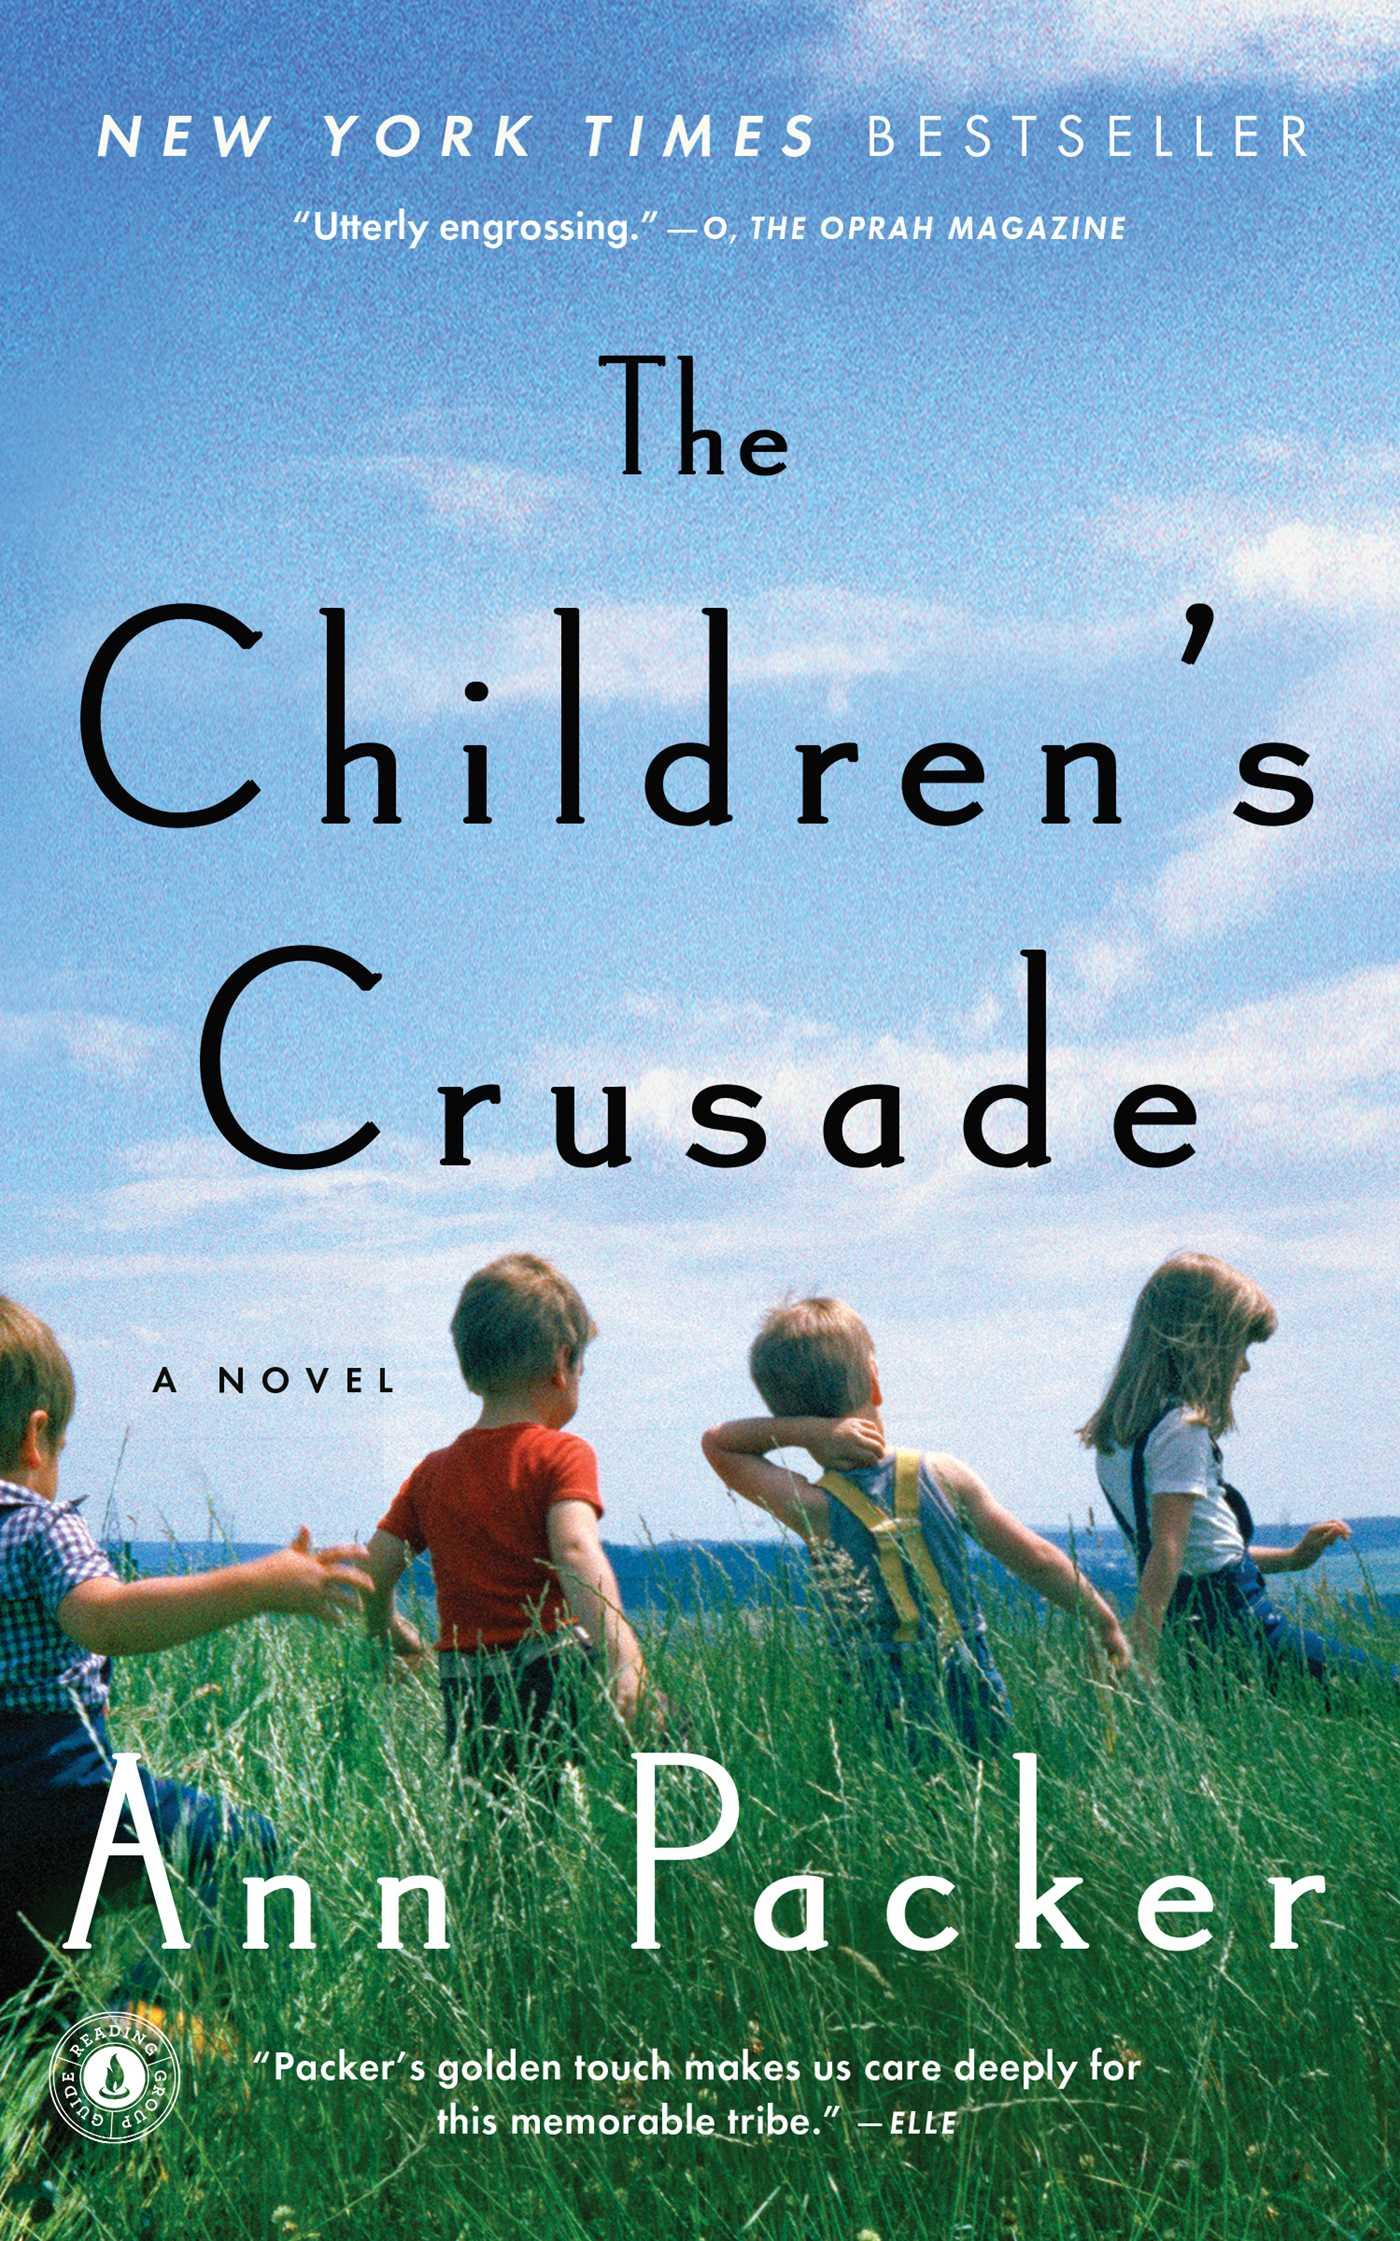 The childrens crusade 9781476710464 hr